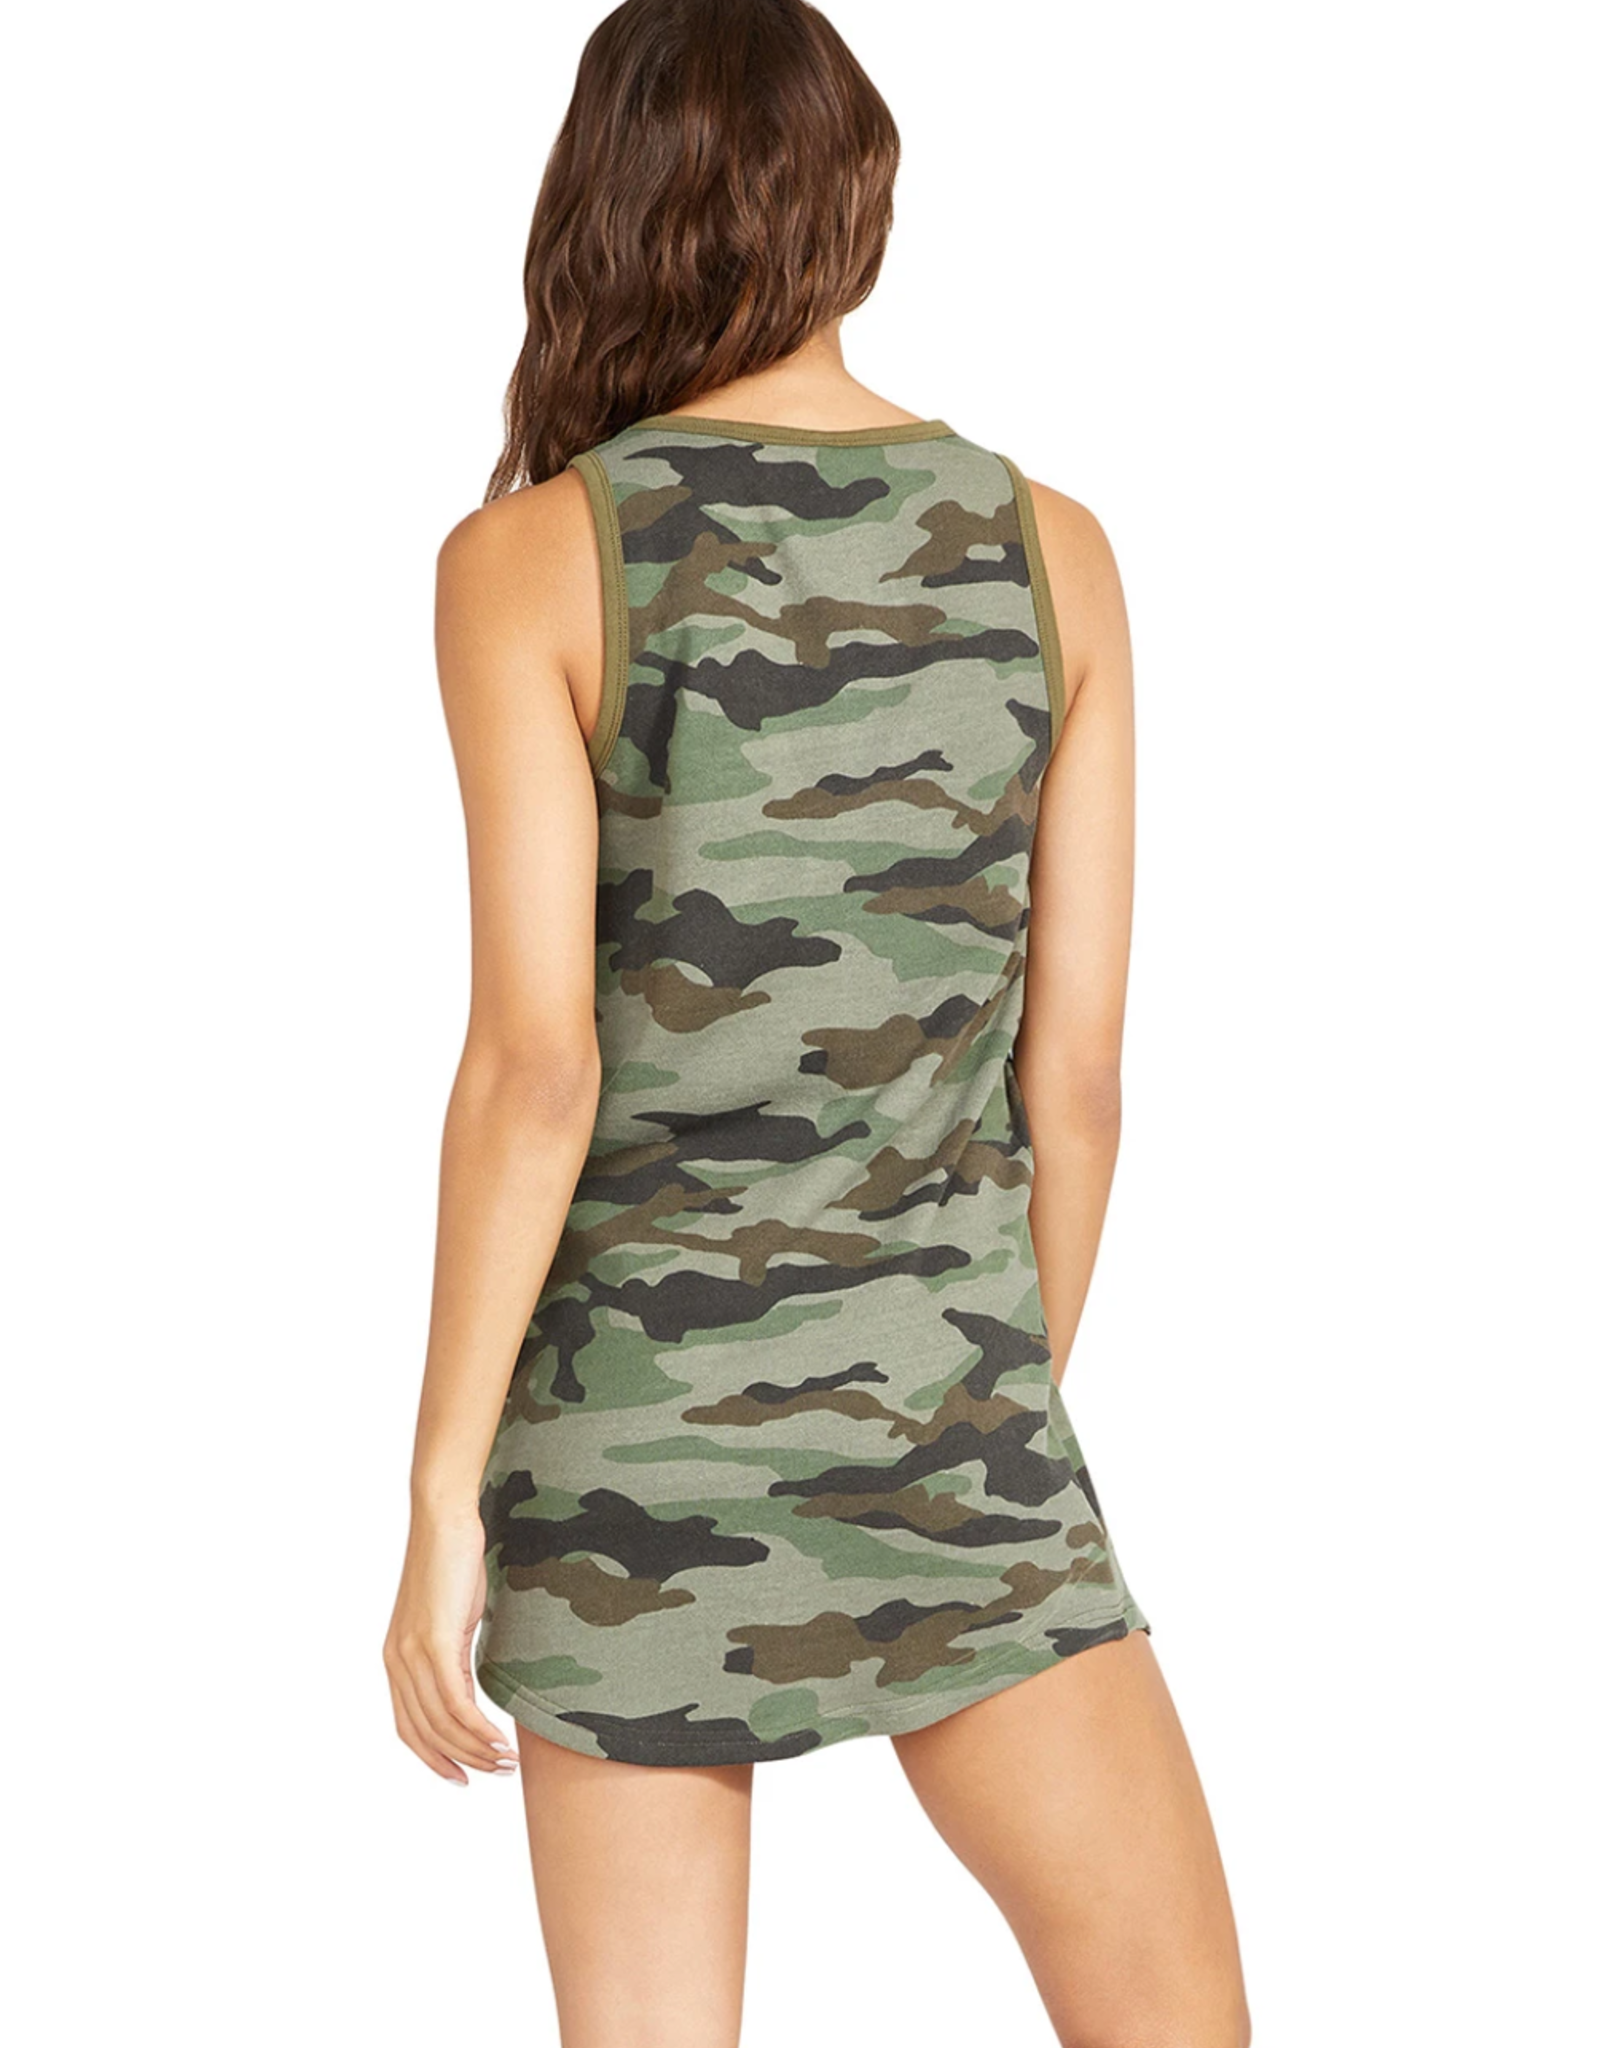 BB Dakota All Terrain Camo Dress